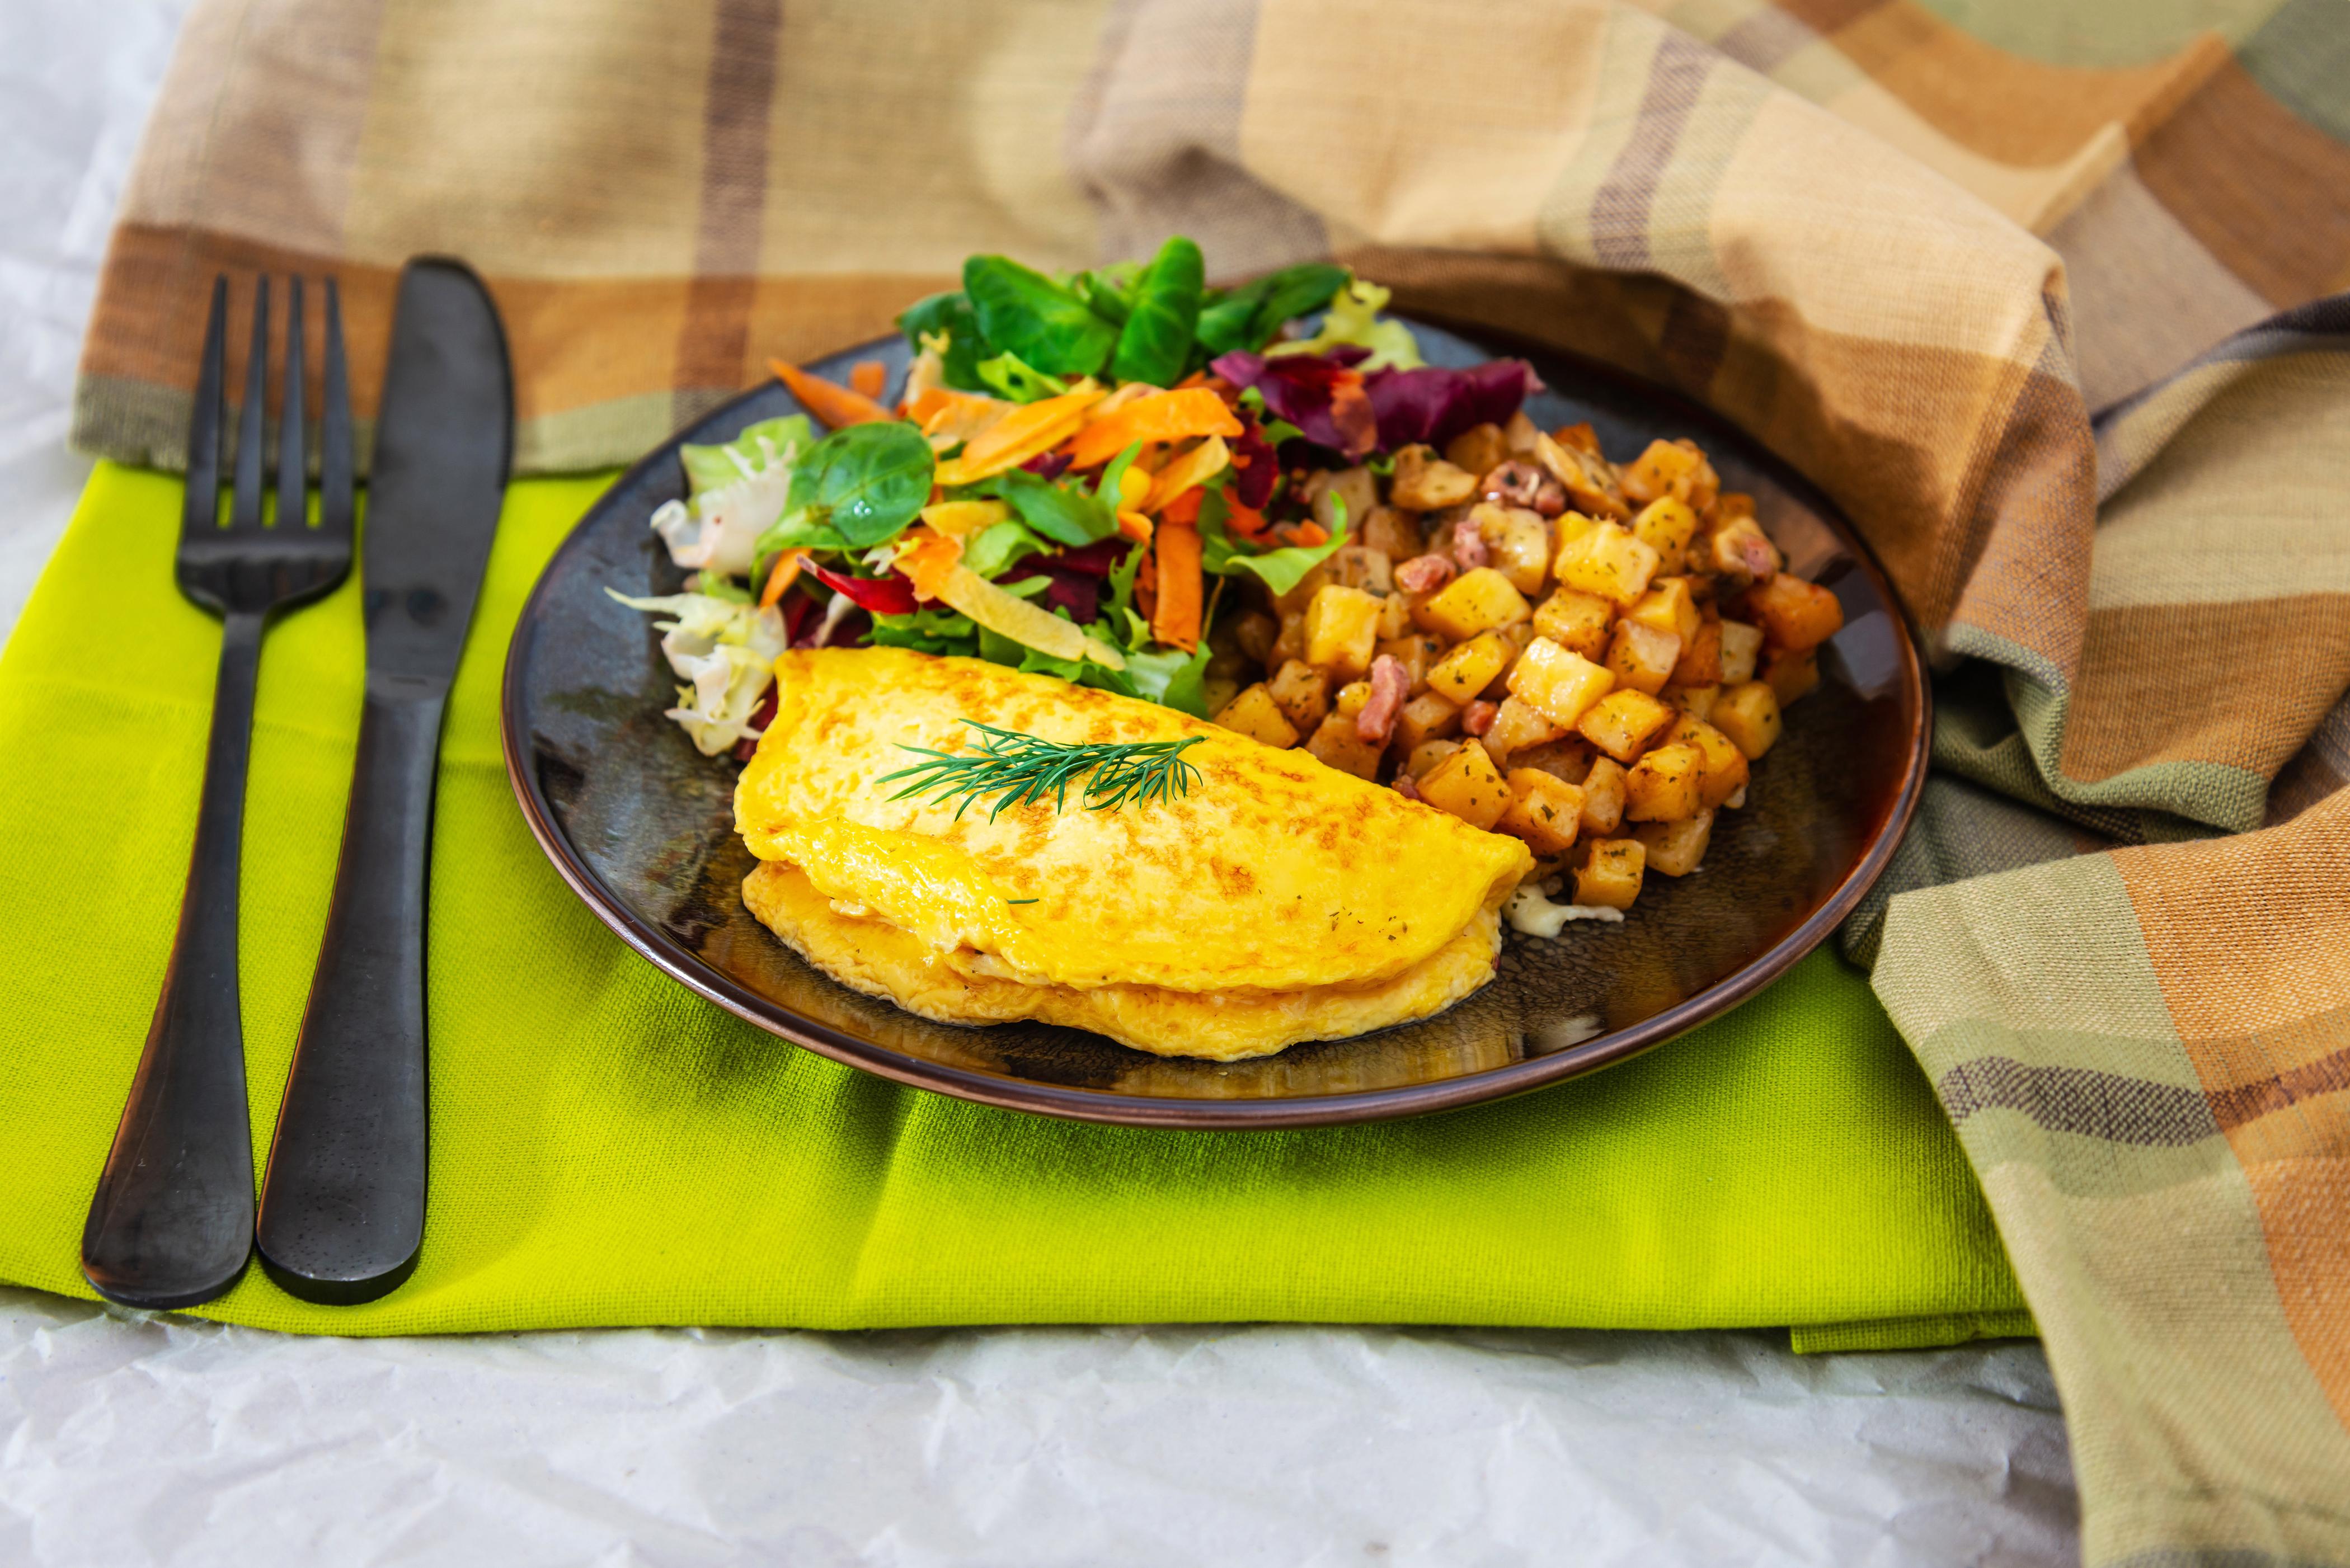 Photos Knife Fried egg Potato Breakfast Fork Food Plate Vegetables 4200x2803